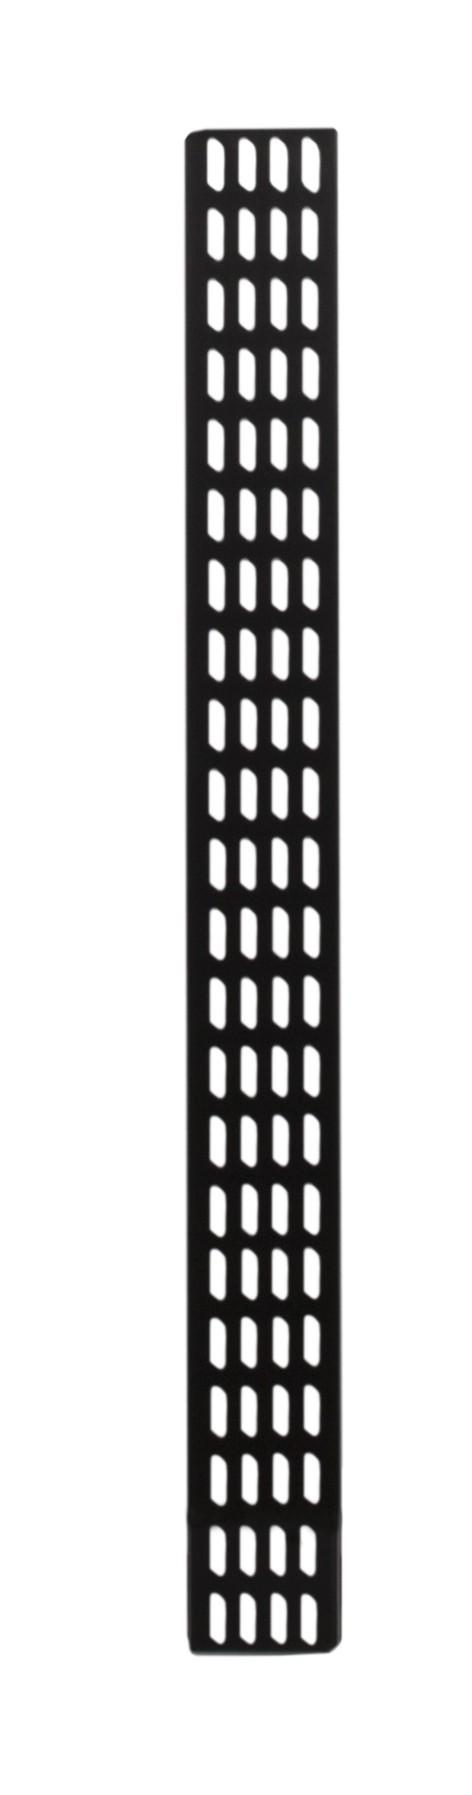 Afbeelding van 22U vertical cable tray - 30 cm